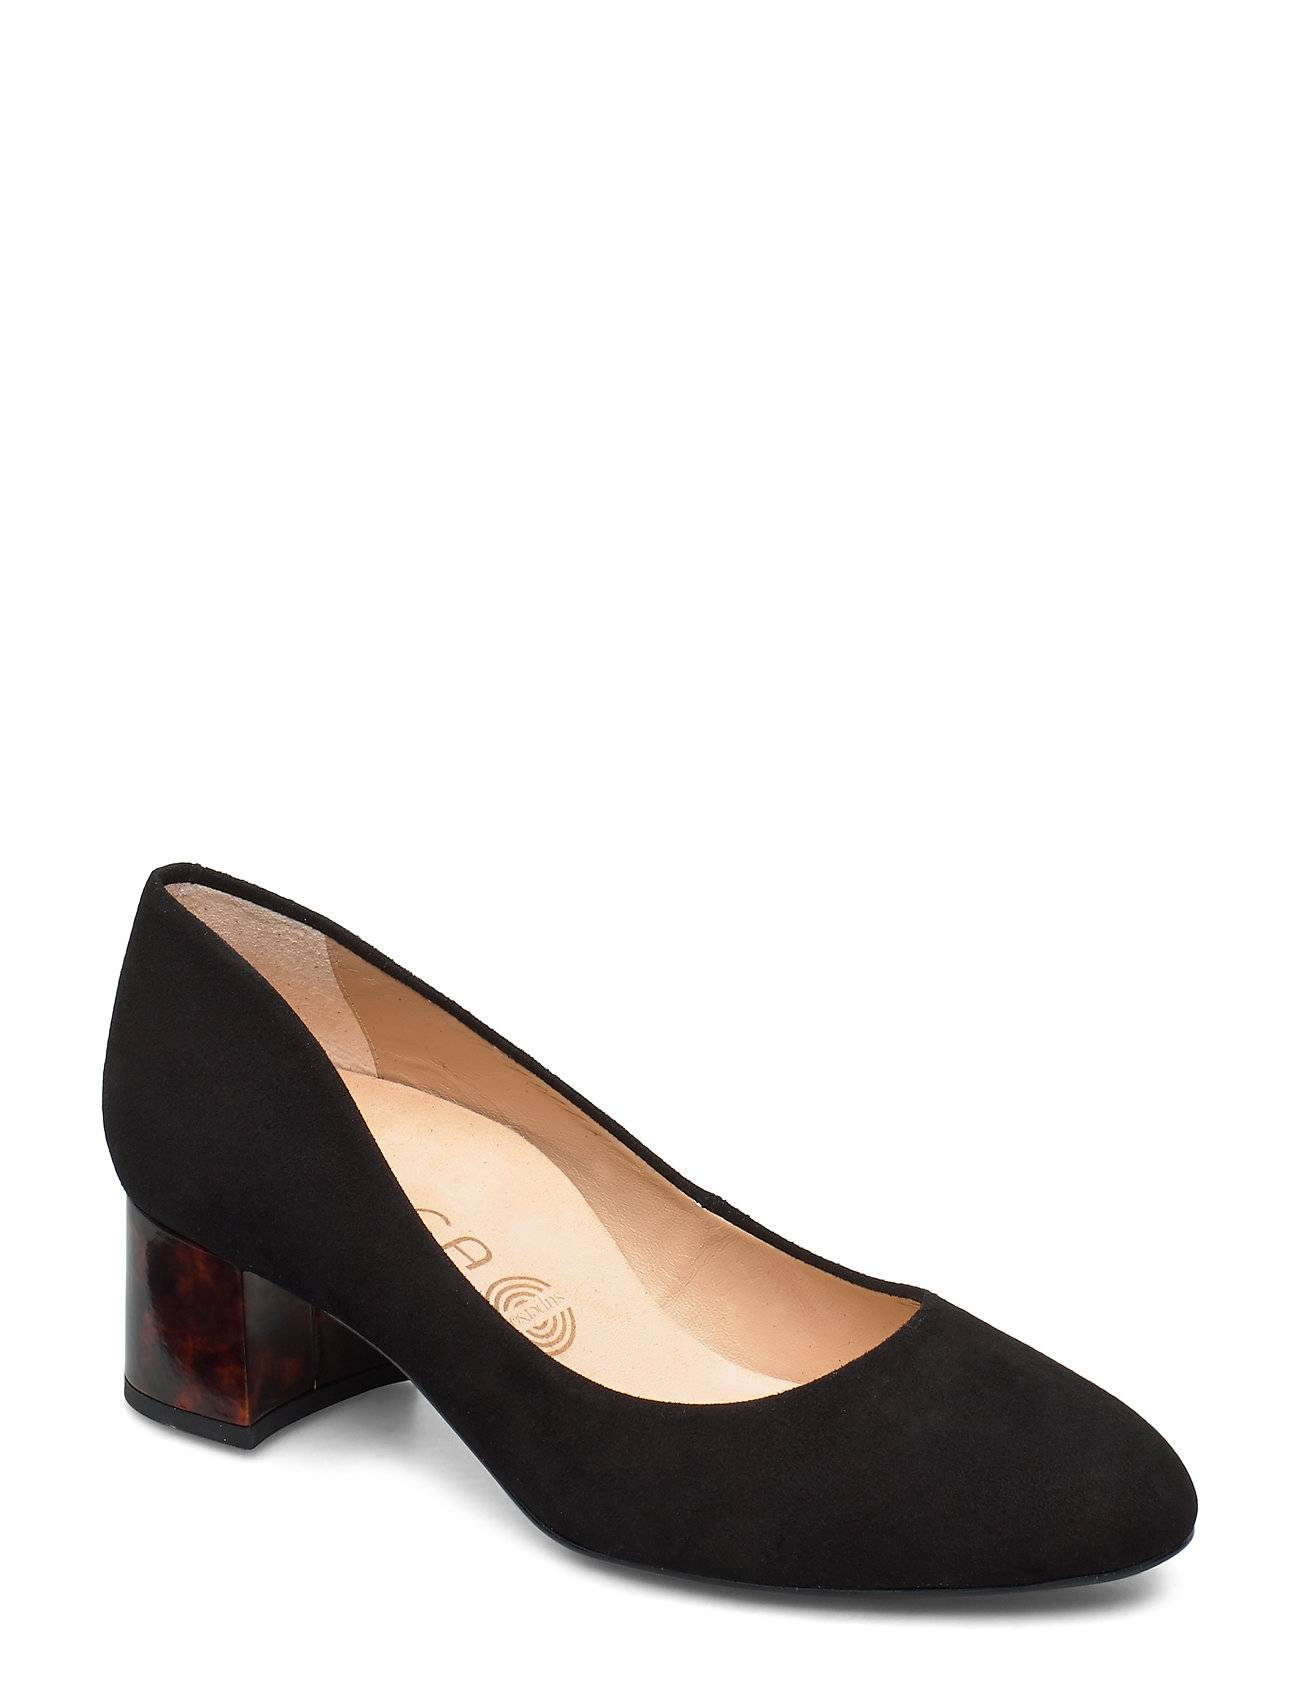 UNISA Lasie_f19_ks_car Shoes Heels Pumps Classic Musta UNISA